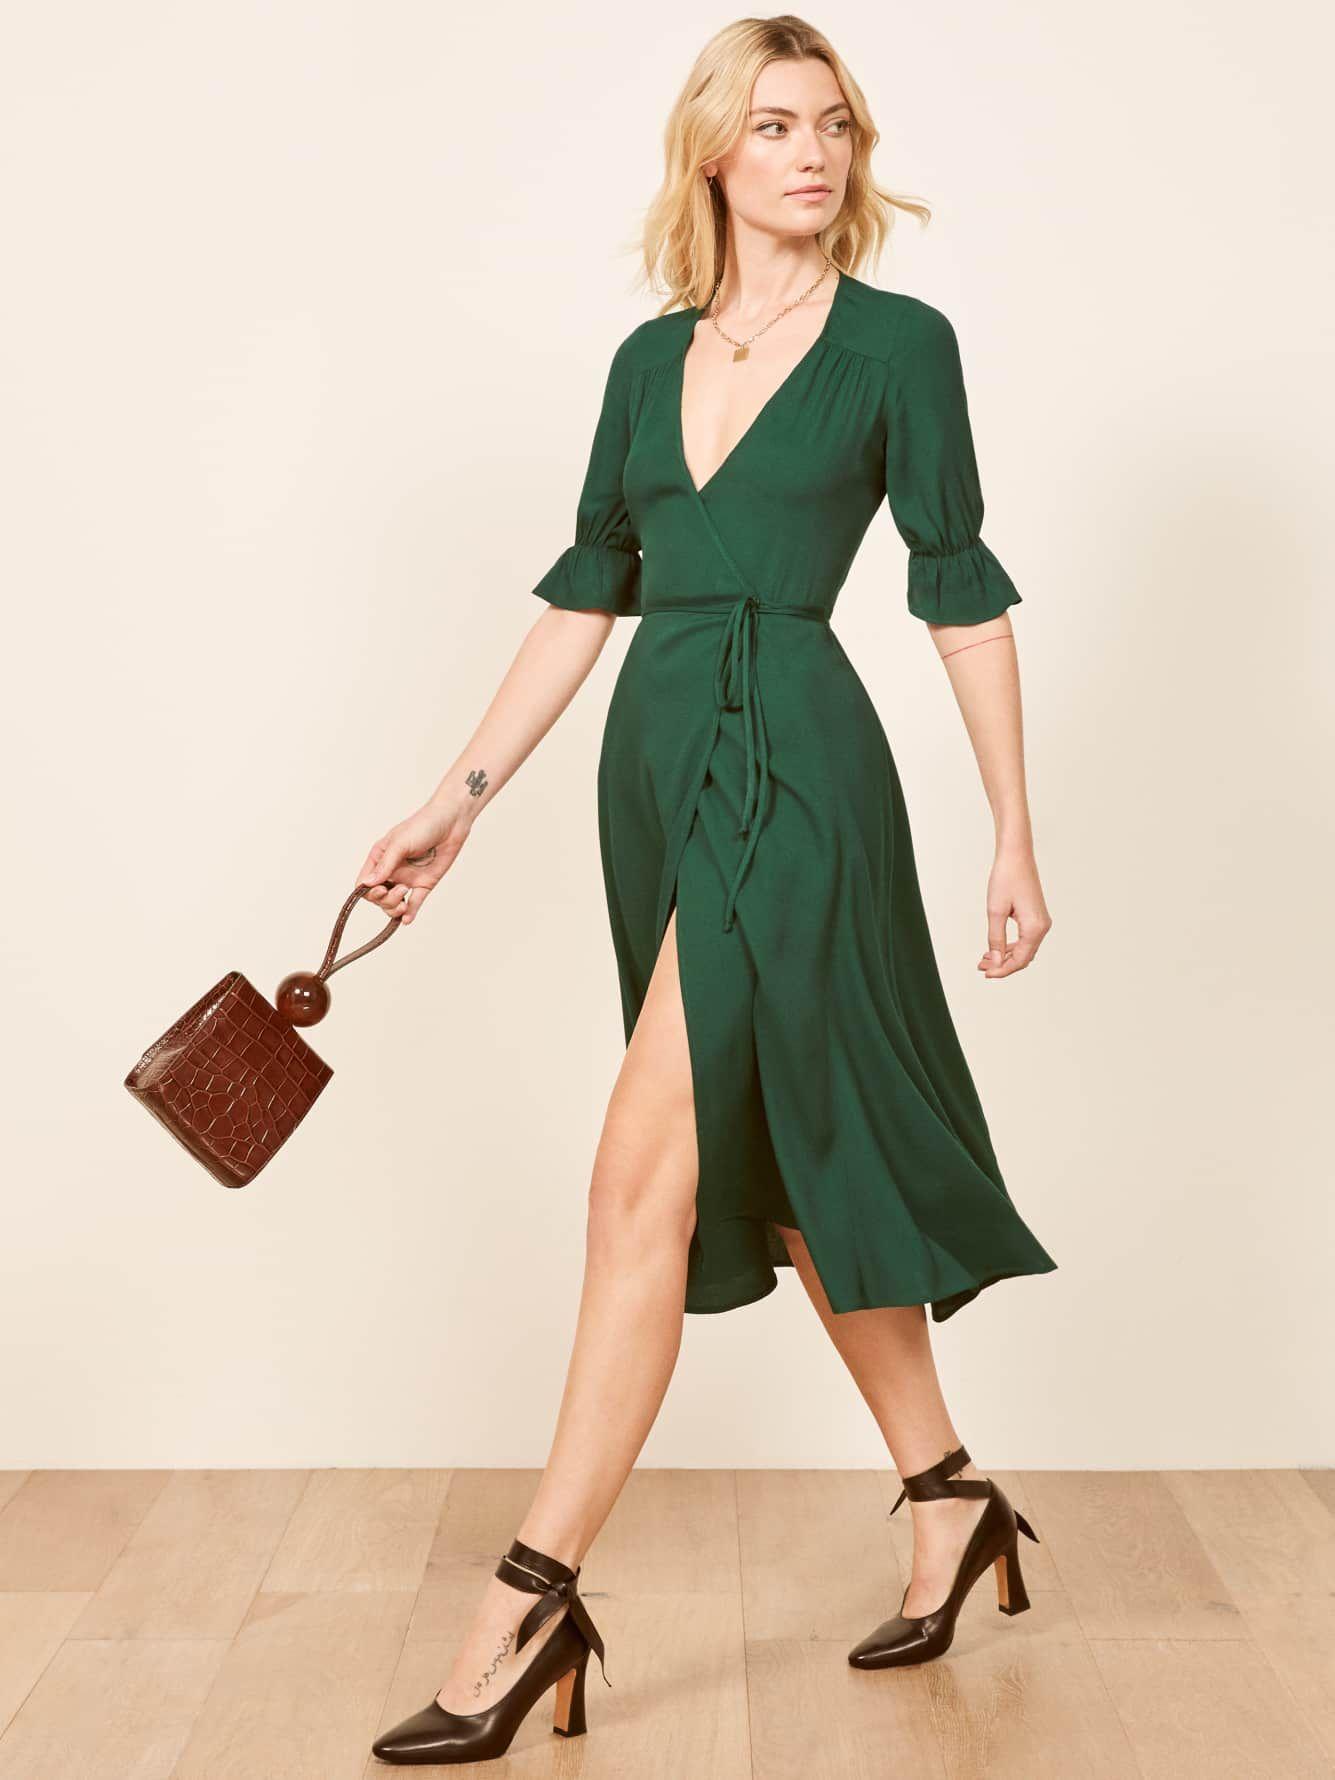 71e40ec56a The Judith Dress | Dresses in 2019 | Dresses, Light dress, Fashion